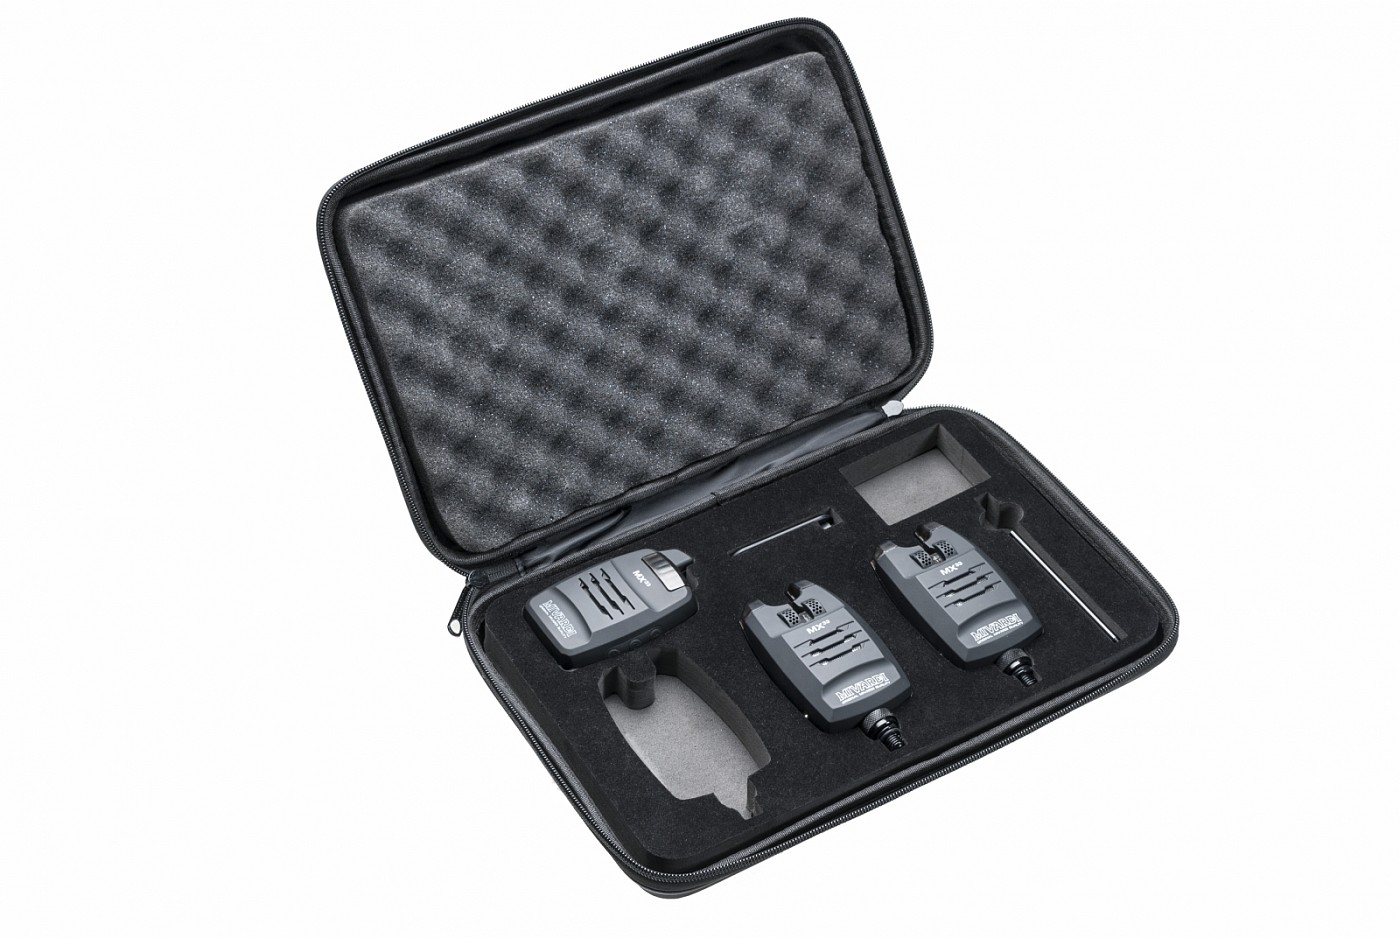 /produkty/47/sady-signalizatorov-cidla/Mivardi/Sada-hlasicov-MX33-ochrana-proti-ukradnutiu